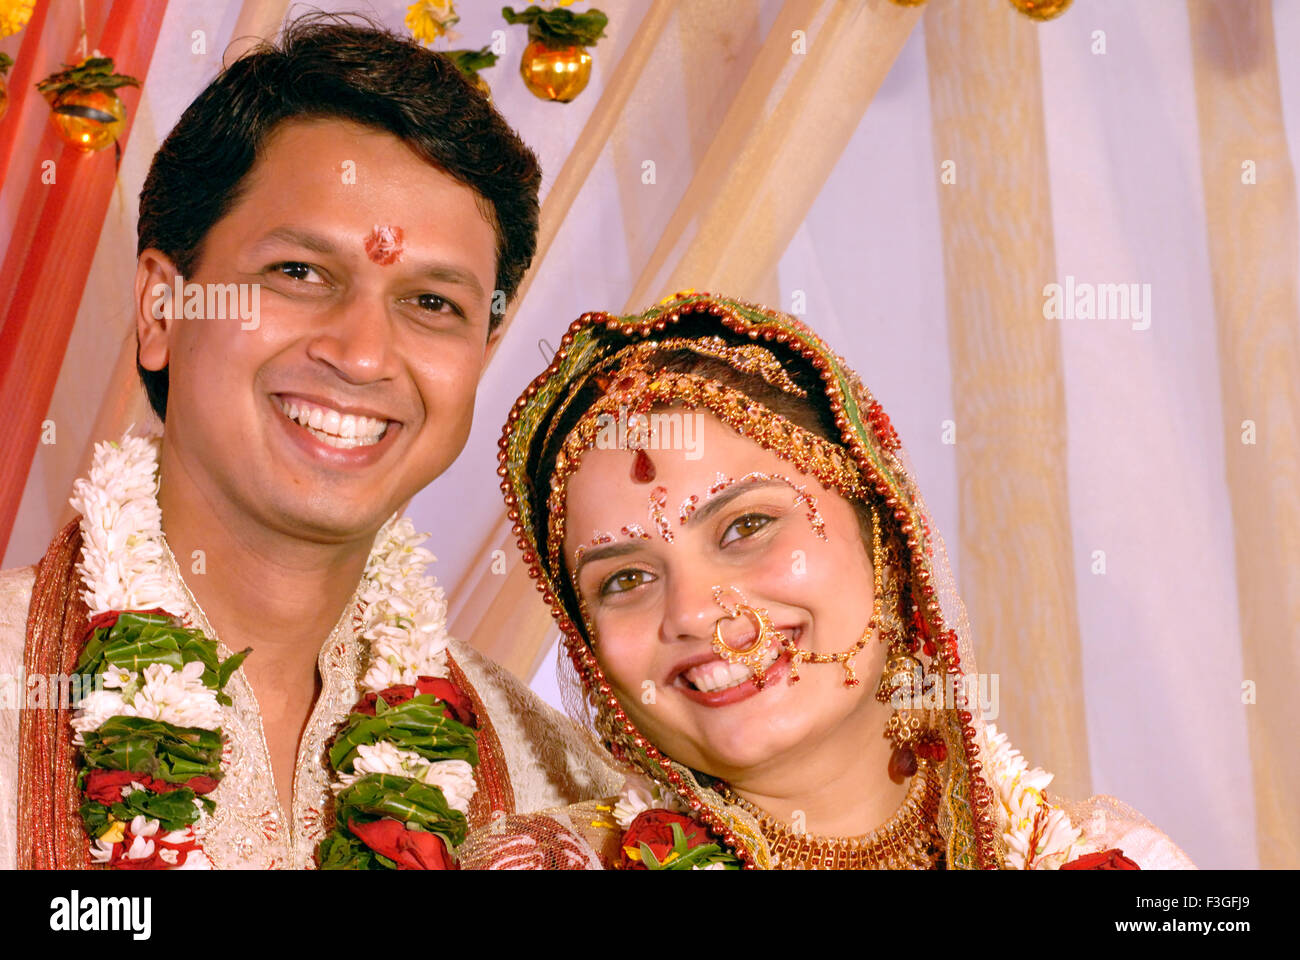 Indian Hindu Gujarati wedding bride and bridegroom looking at camera happy smiling faces - MR#364 - RMM 123501 - Stock Image